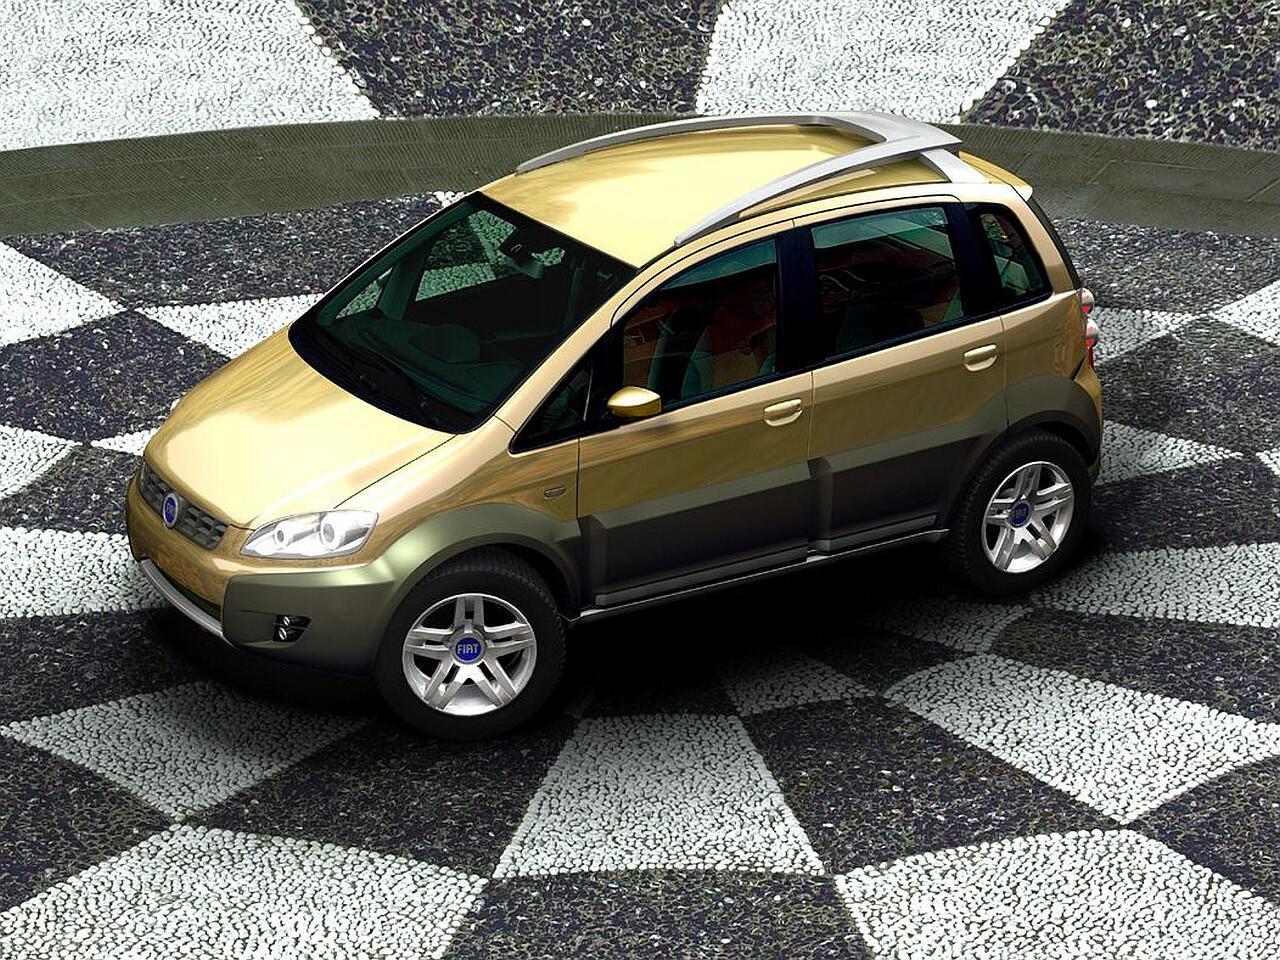 Bild zu Fiat Idea 5terre Concept (2004)